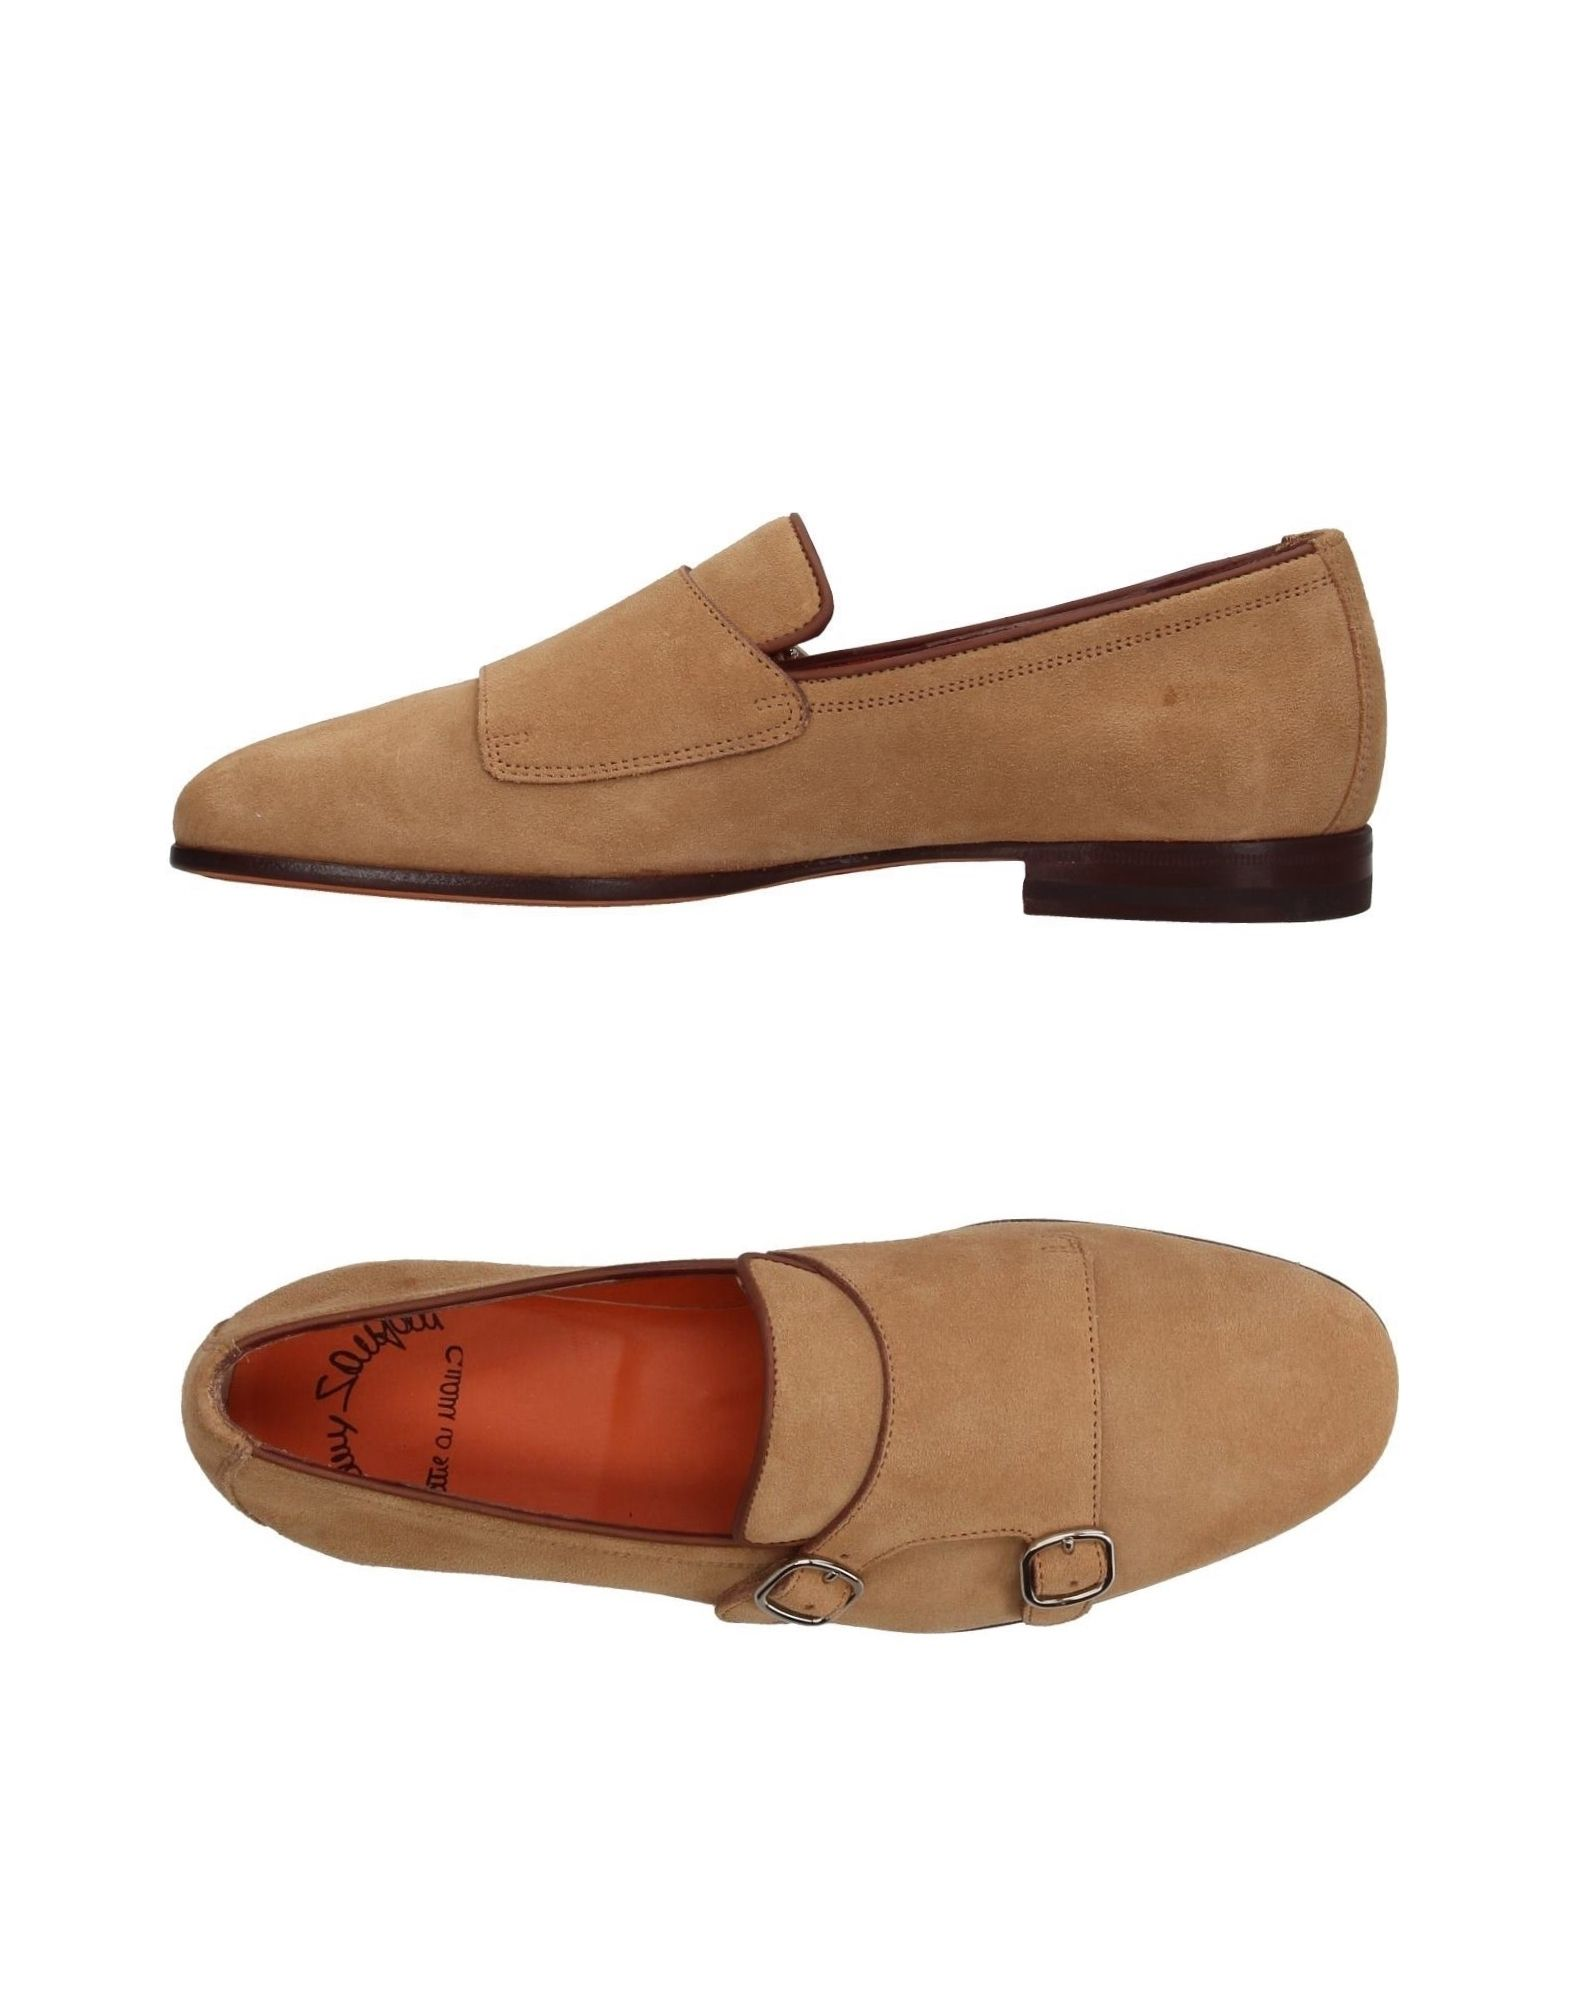 Santoni Mokassins Herren  11409473GW Gute Qualität beliebte Schuhe